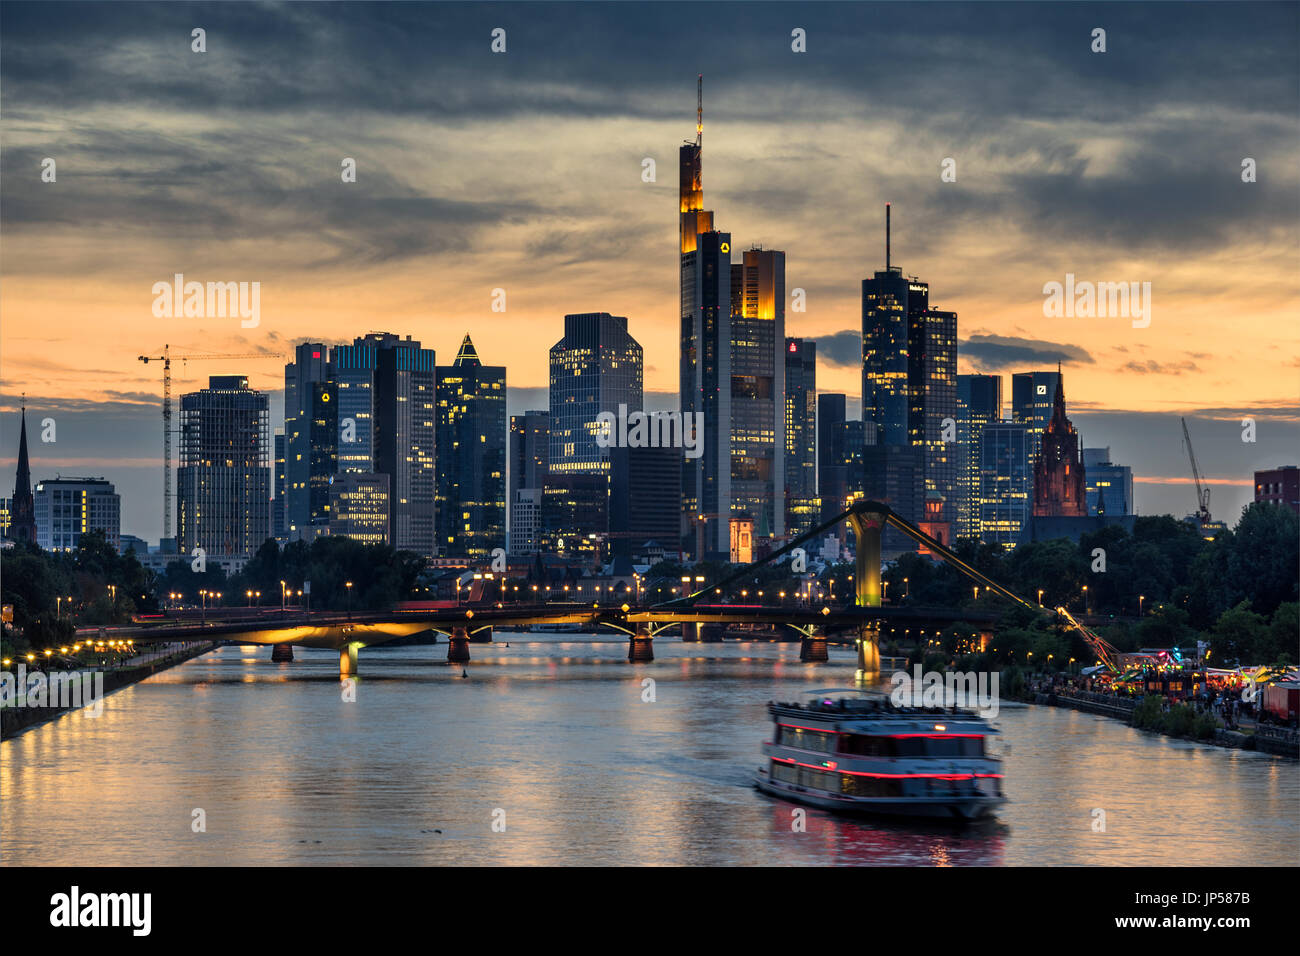 Looking Across The Main River To The CBD In Frankfurt Am Main In - Frankfurt river